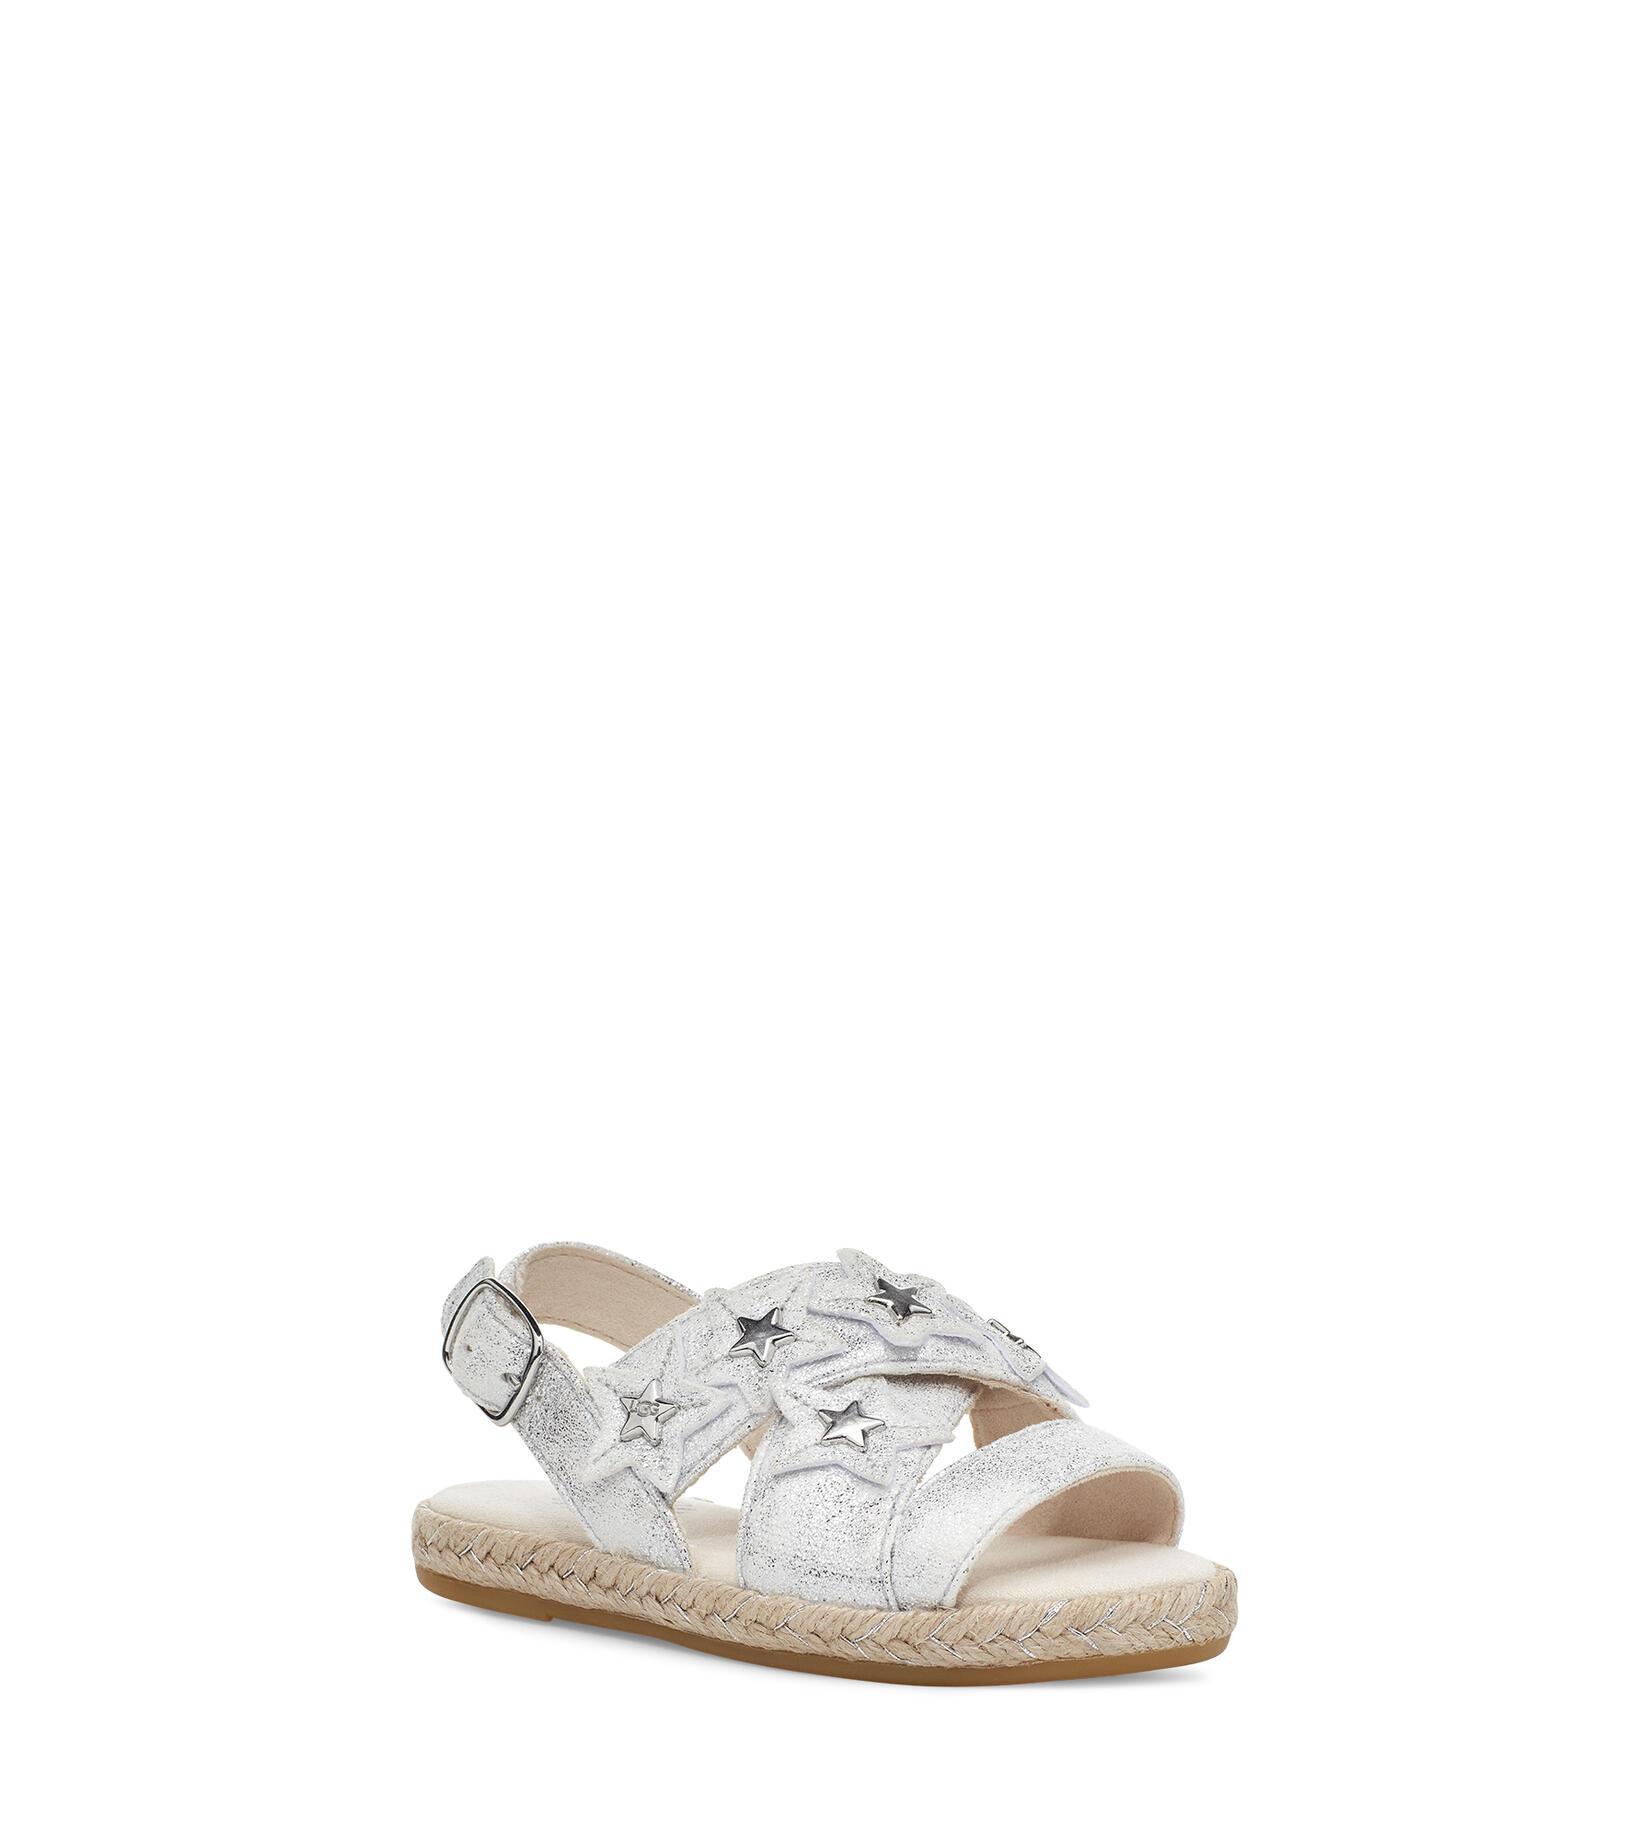 Allairey Stars Sandal